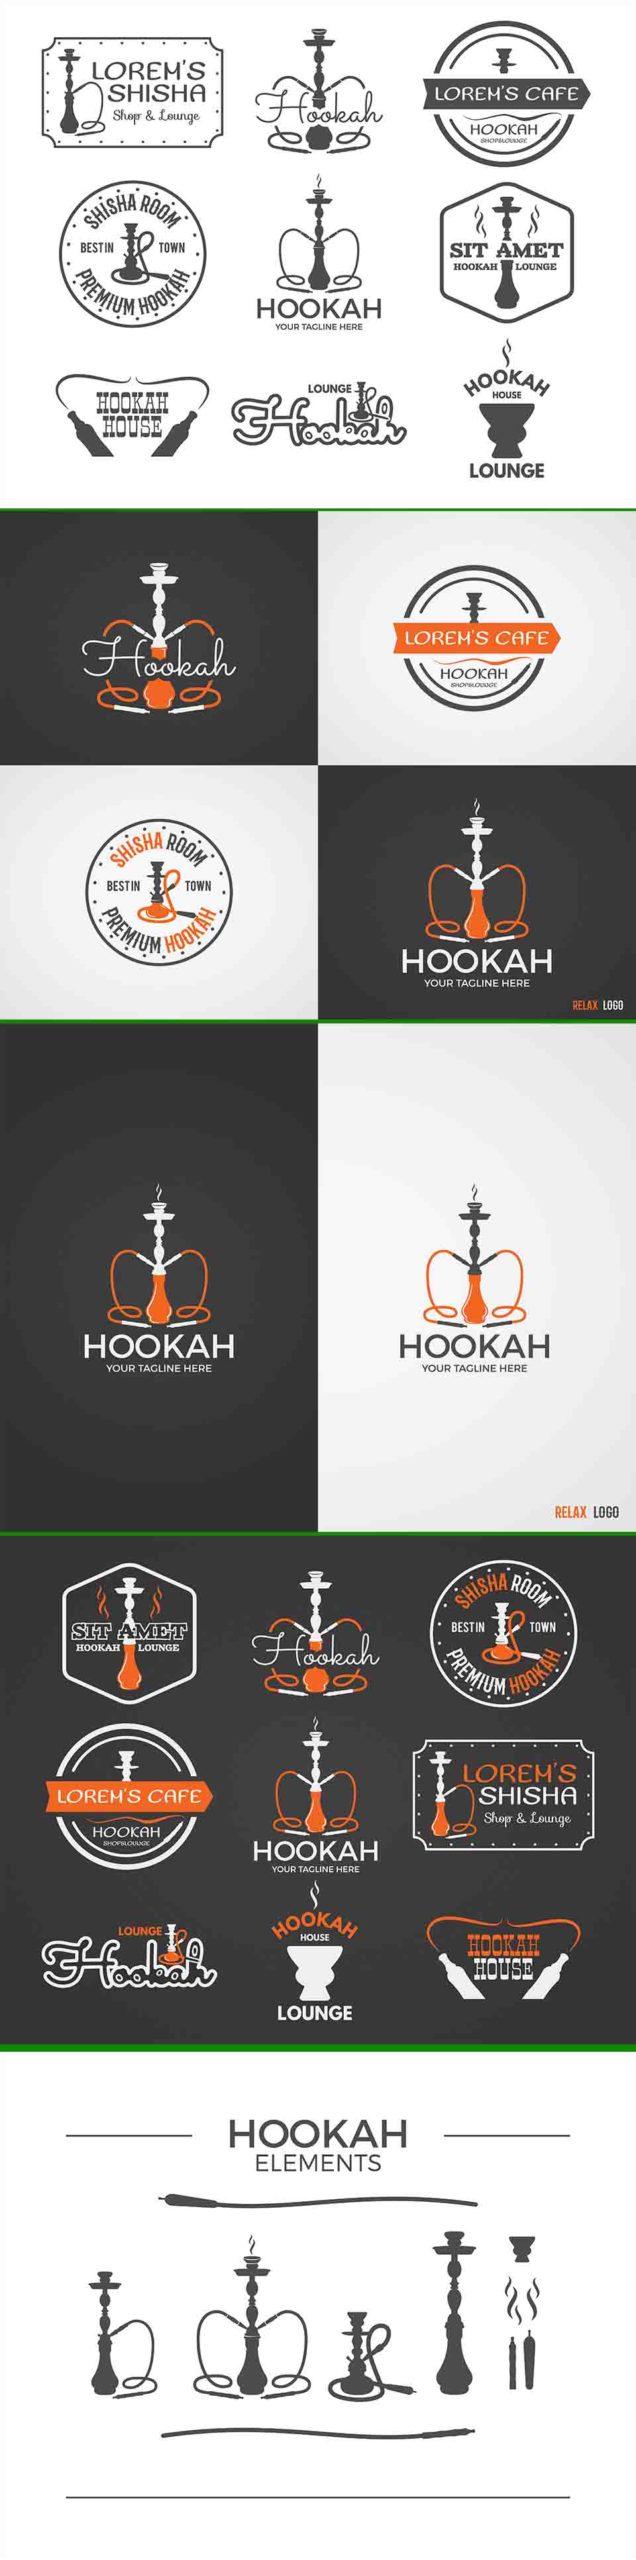 Best 10 Hookah And Cafe Logo Vector For Adobe Illustrator Free Download